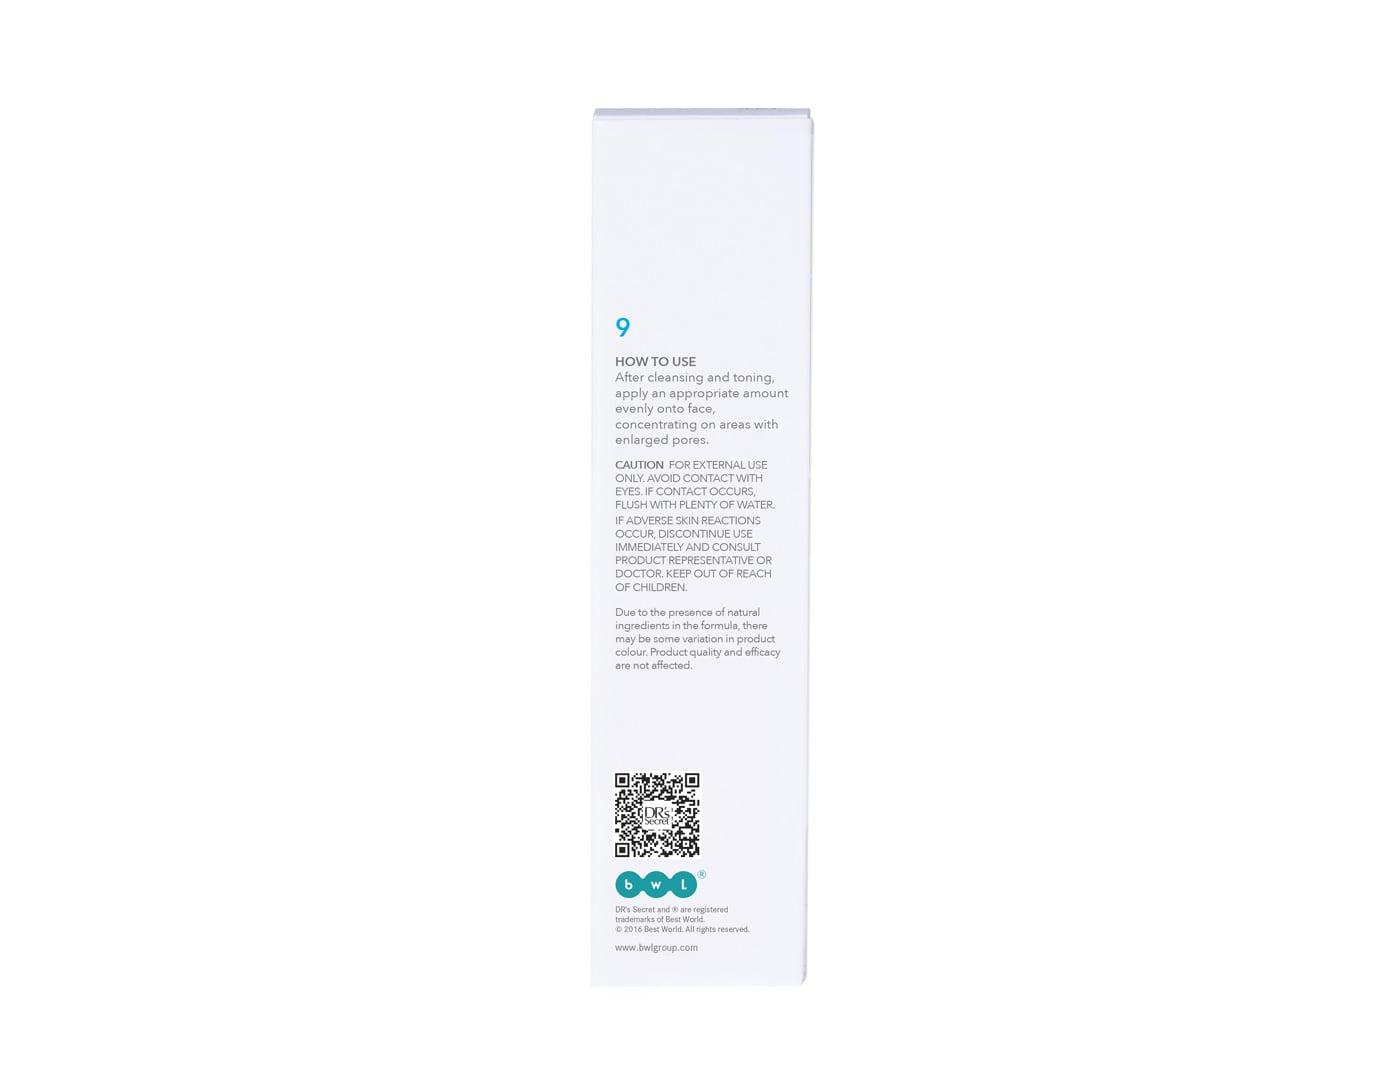 DR's Secret Refining Serum 9 box back packaging